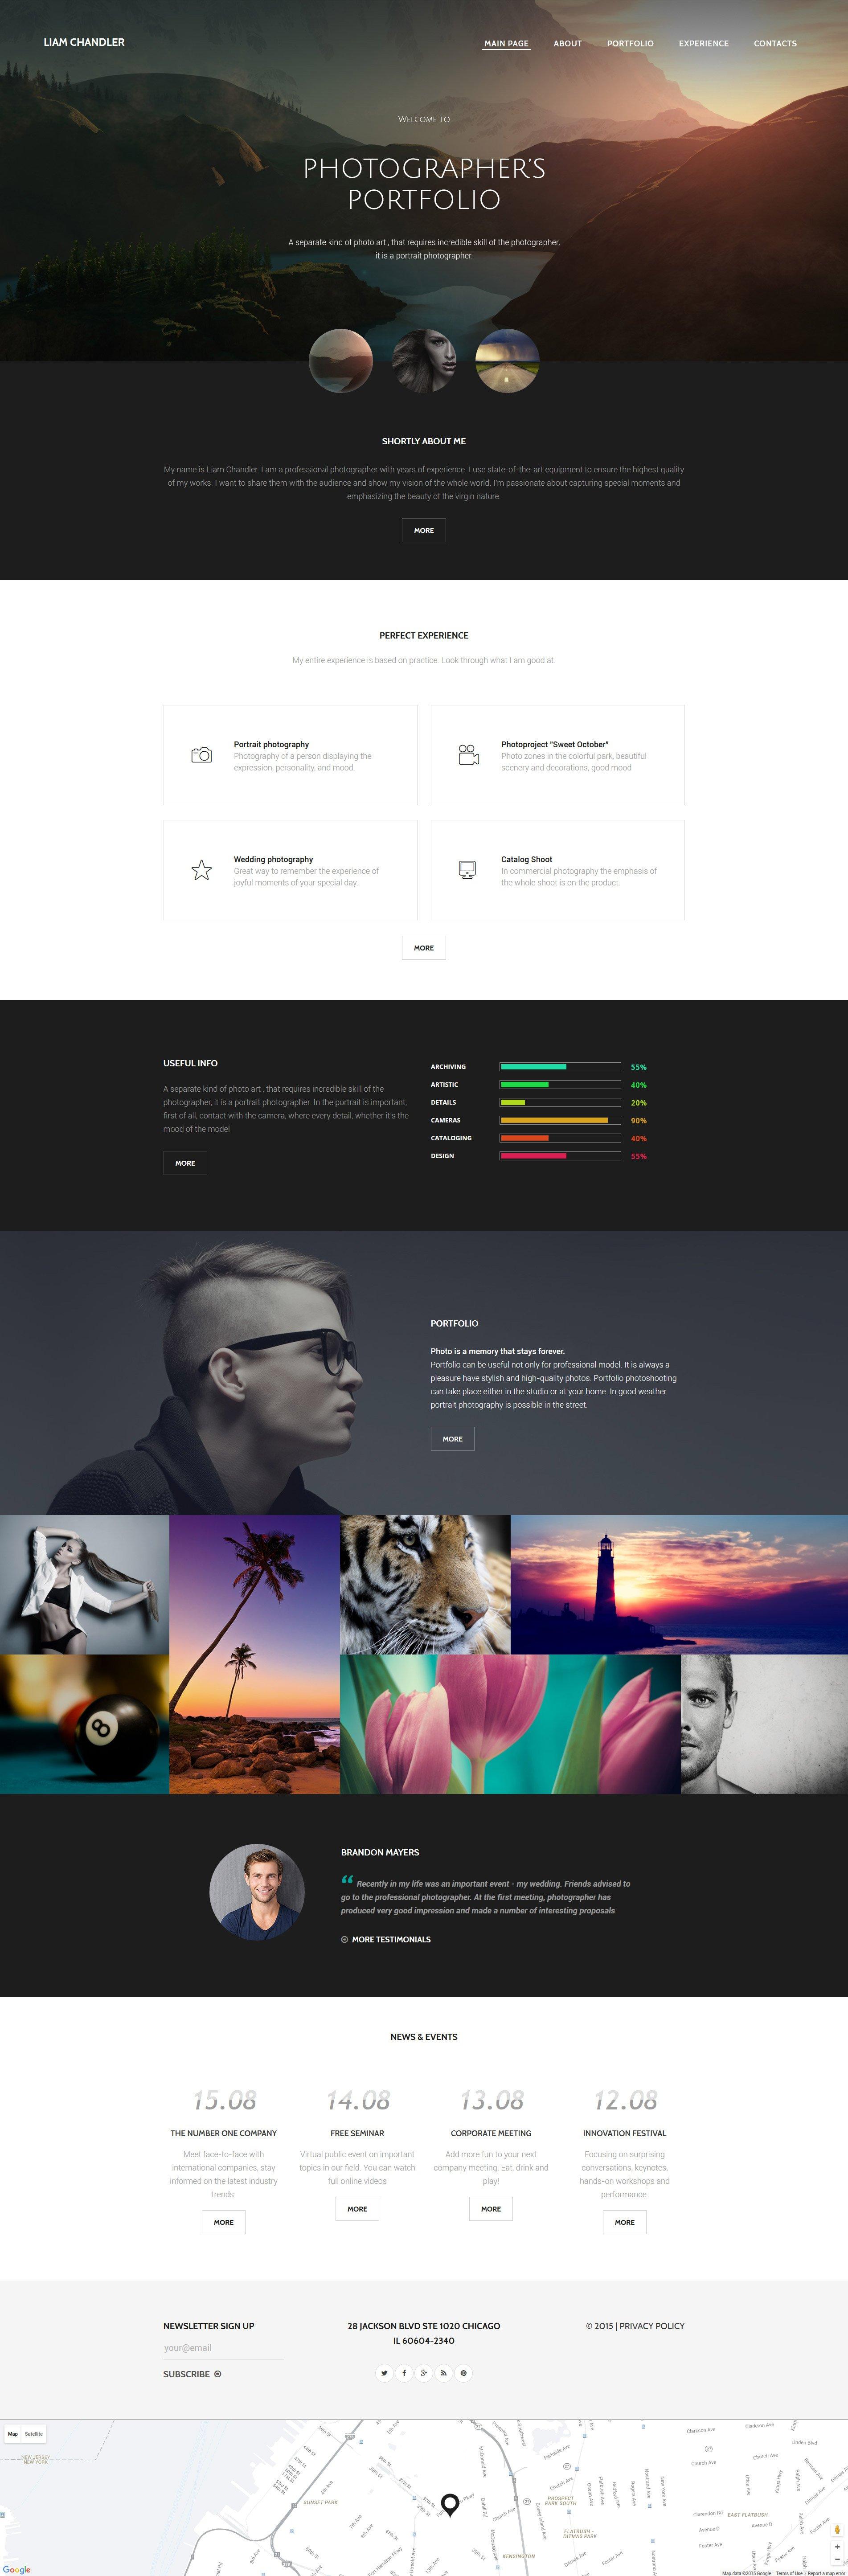 Photographer Portfolio Website Template - screenshot